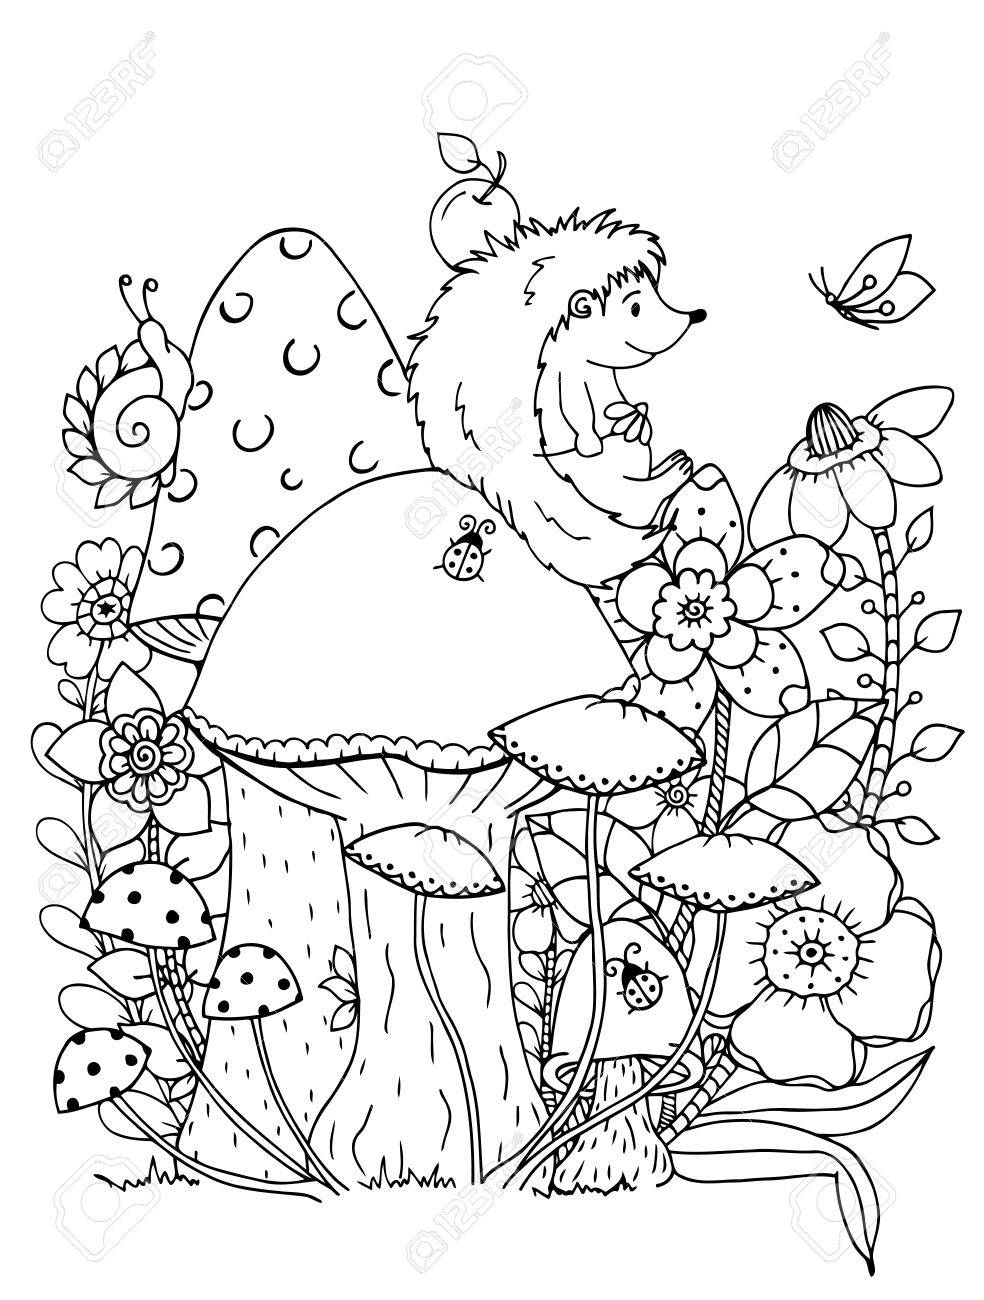 Abbildung Zentangle. Doodle Igel Malvorlage Anti Stress Für